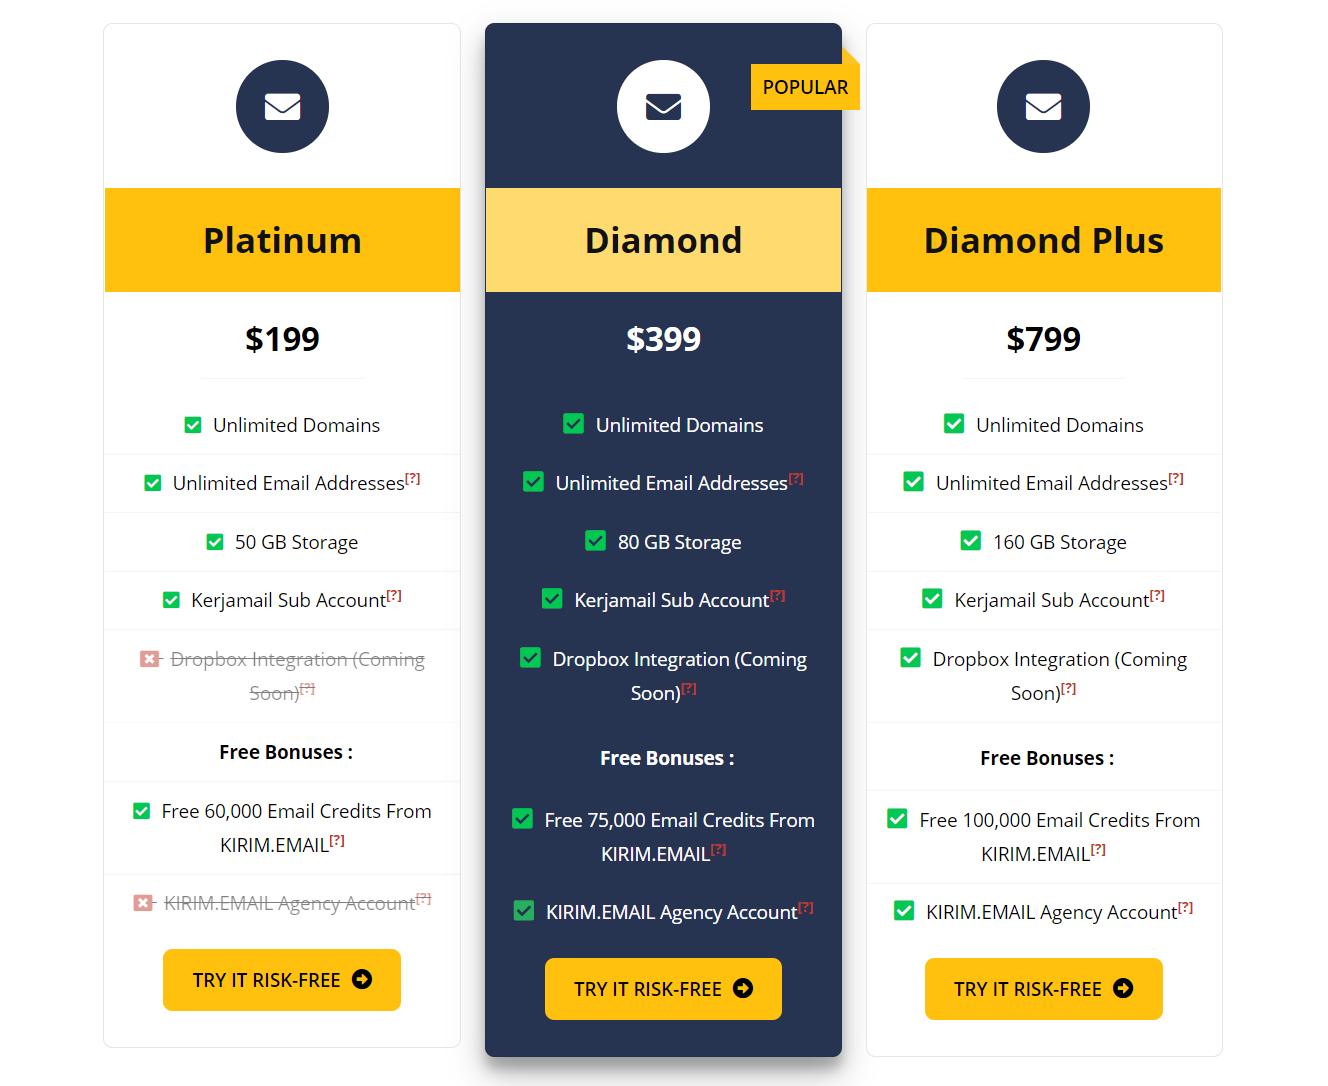 Kerjamail - Lifetime Deal Pricing